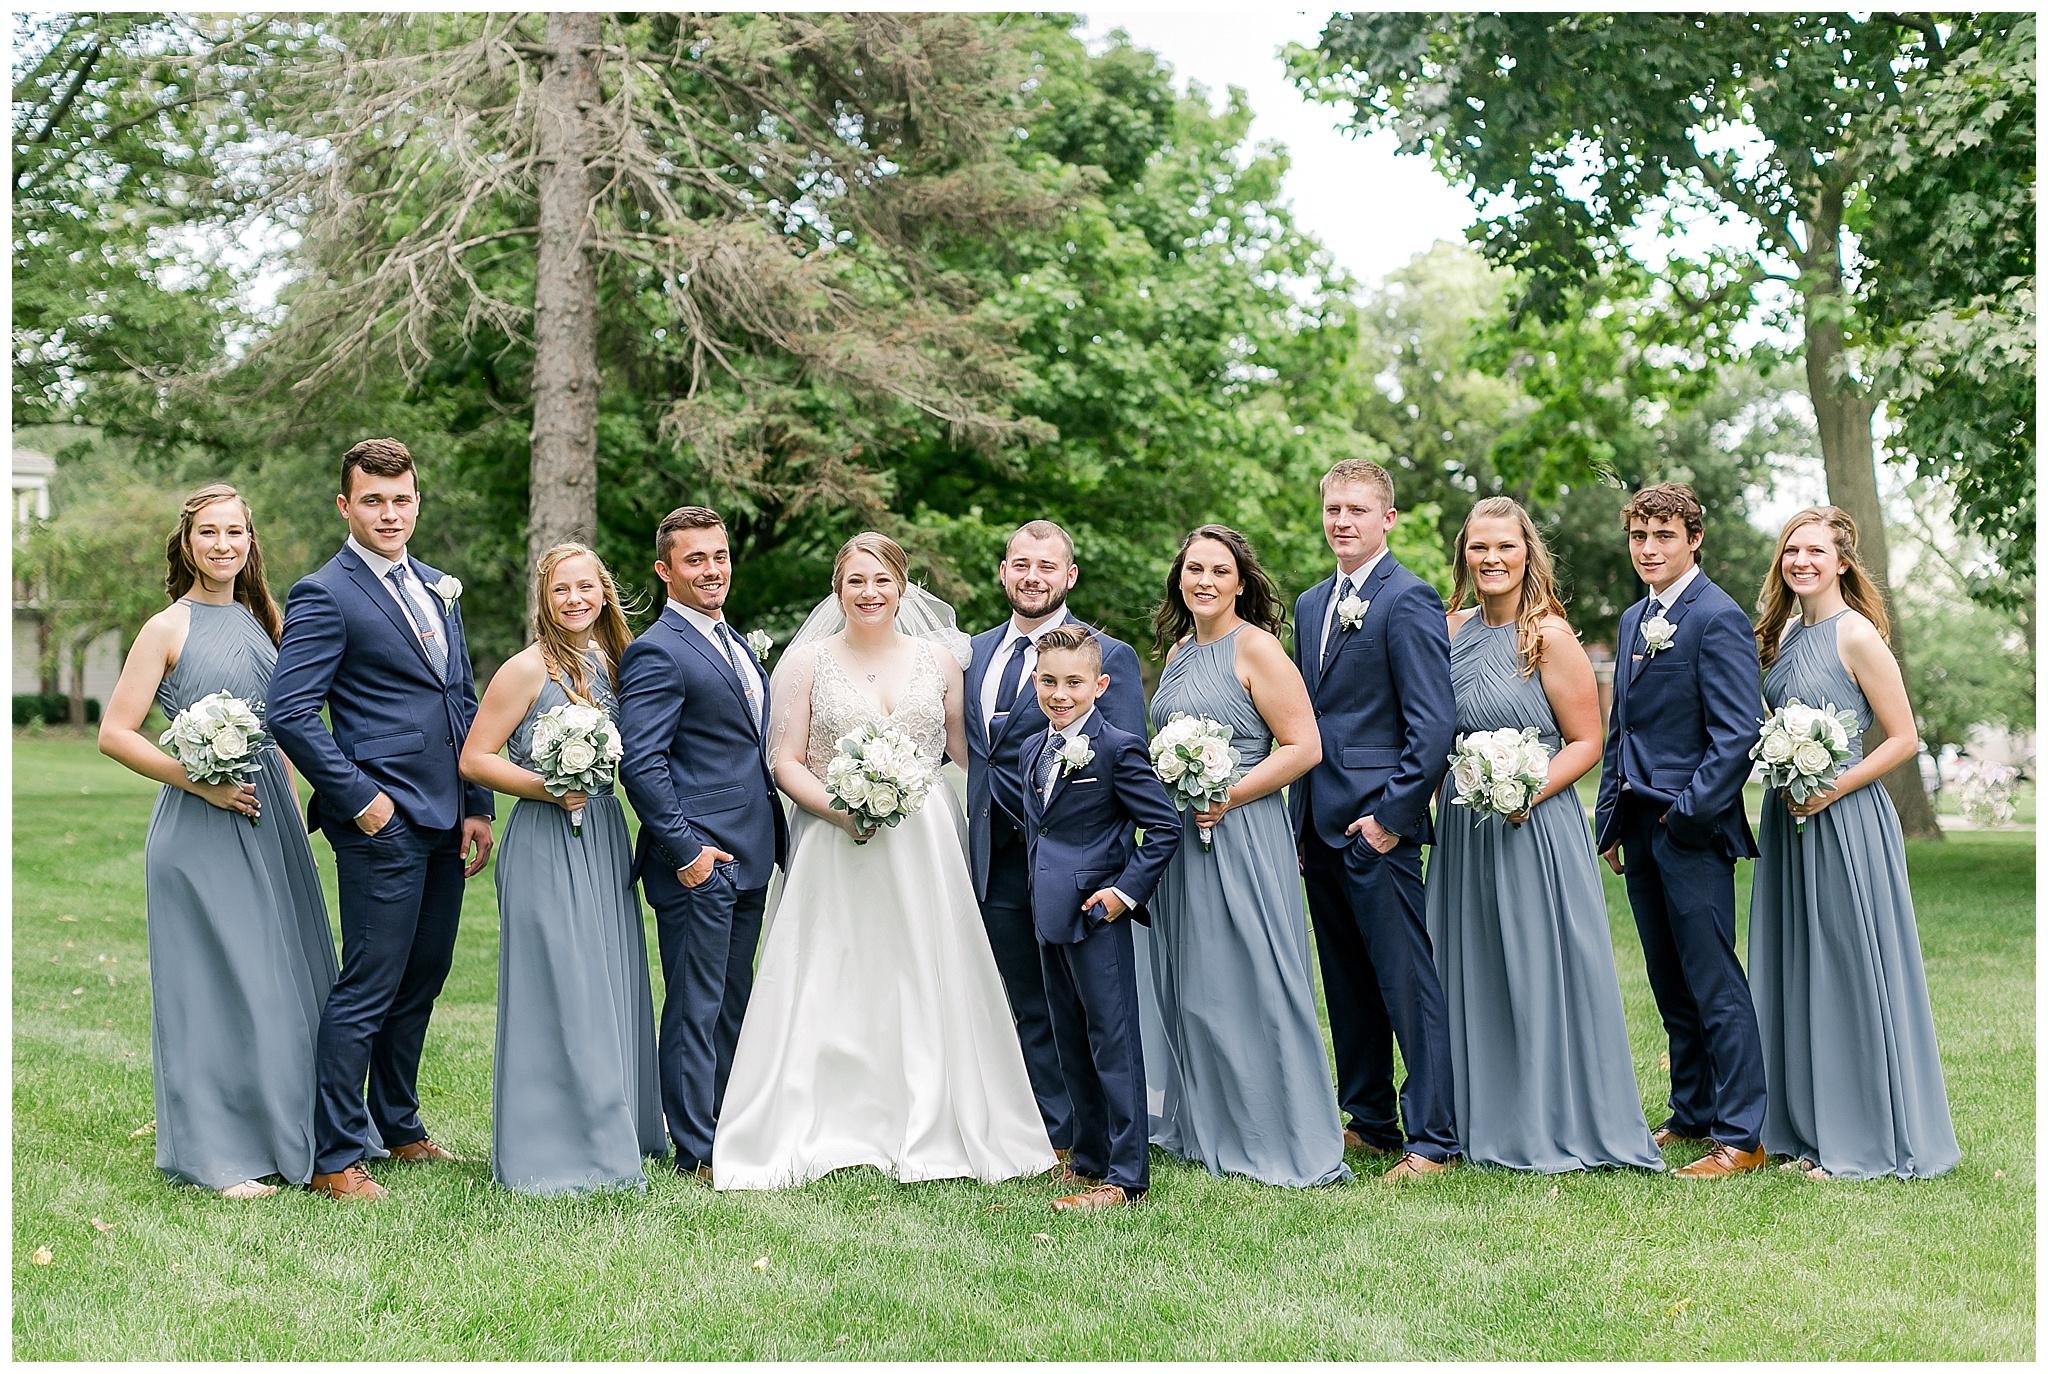 la_casa_grande_wedding_beloit_wisconsin_caynay_photo_0014.jpg